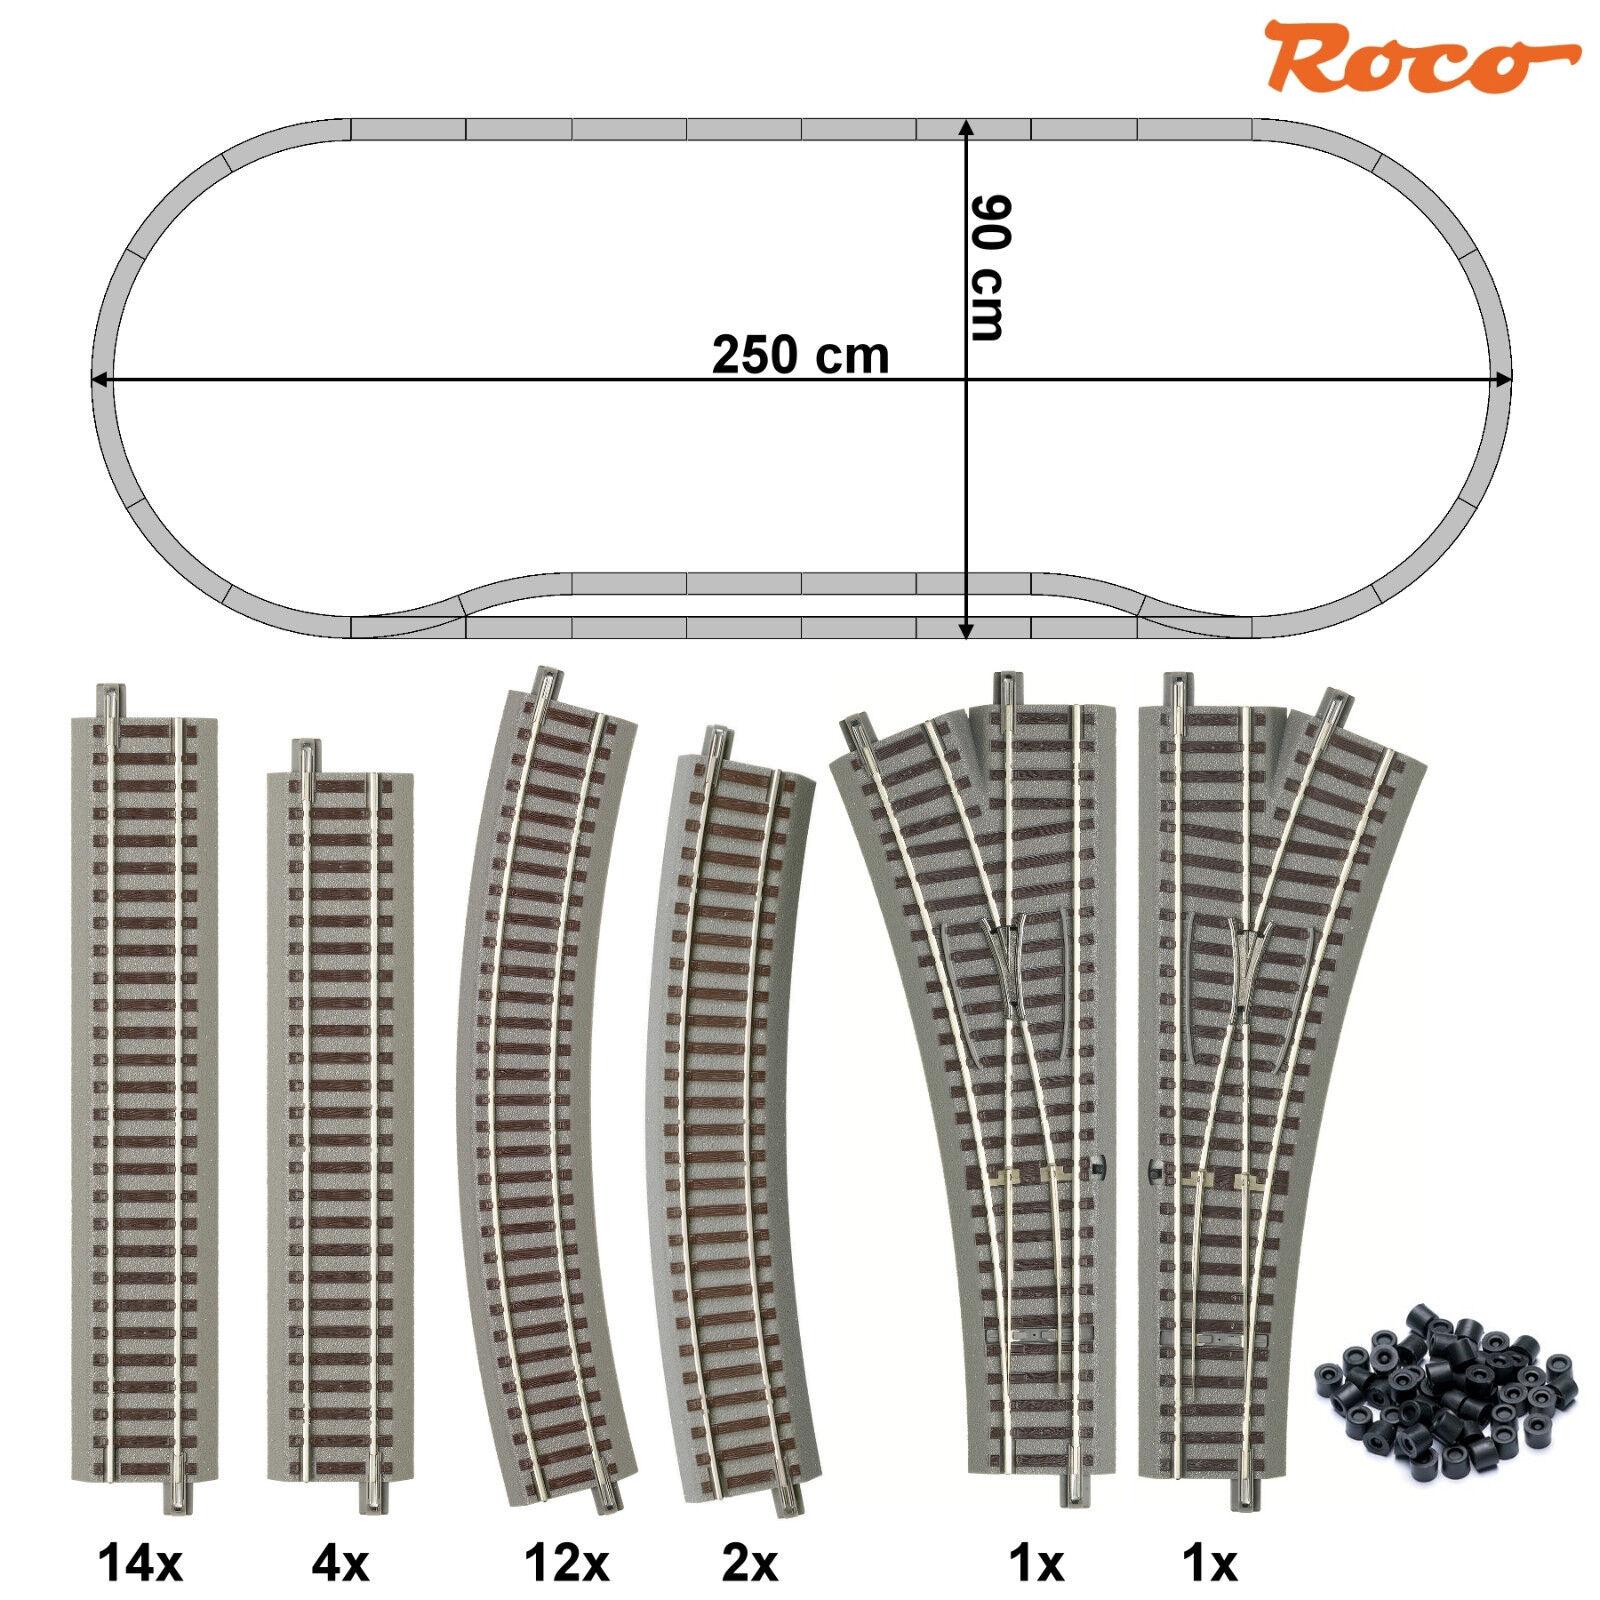 ROCO Binario 61151-s1 - Set 34 pezzi con 2 morbido + + Nuovo + +